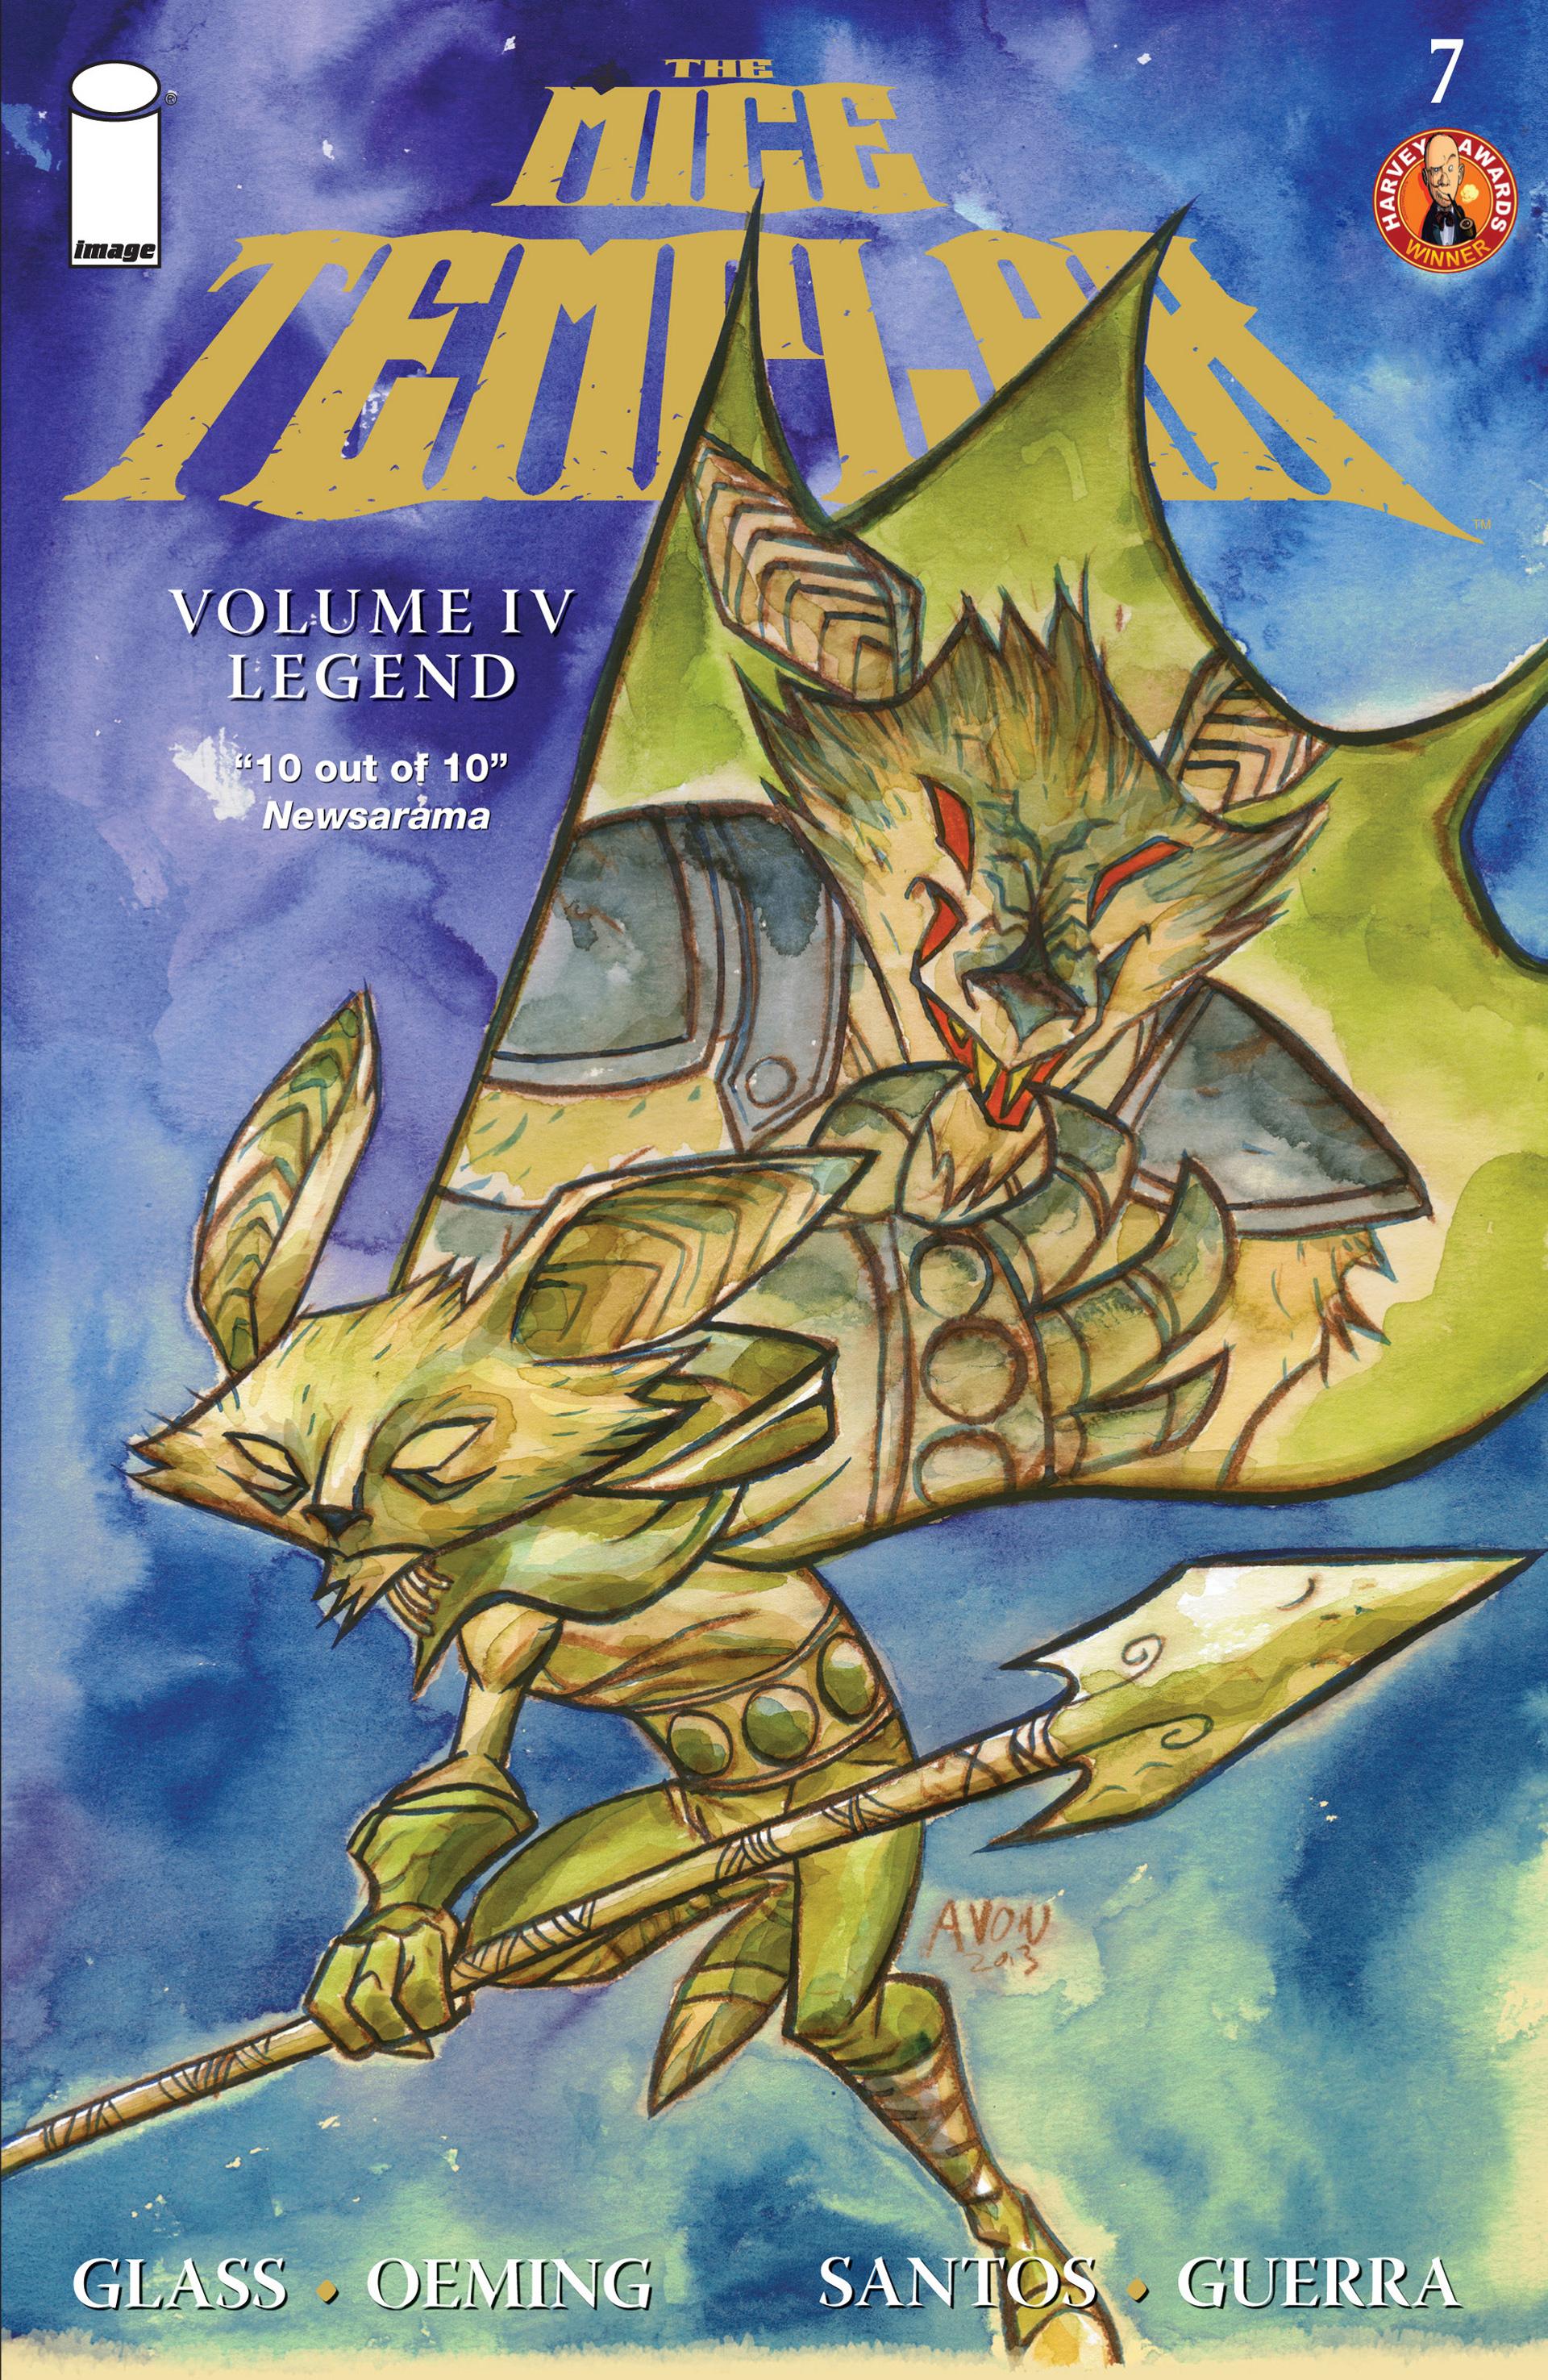 The Mice Templar Volume 4: Legend 7 Page 1